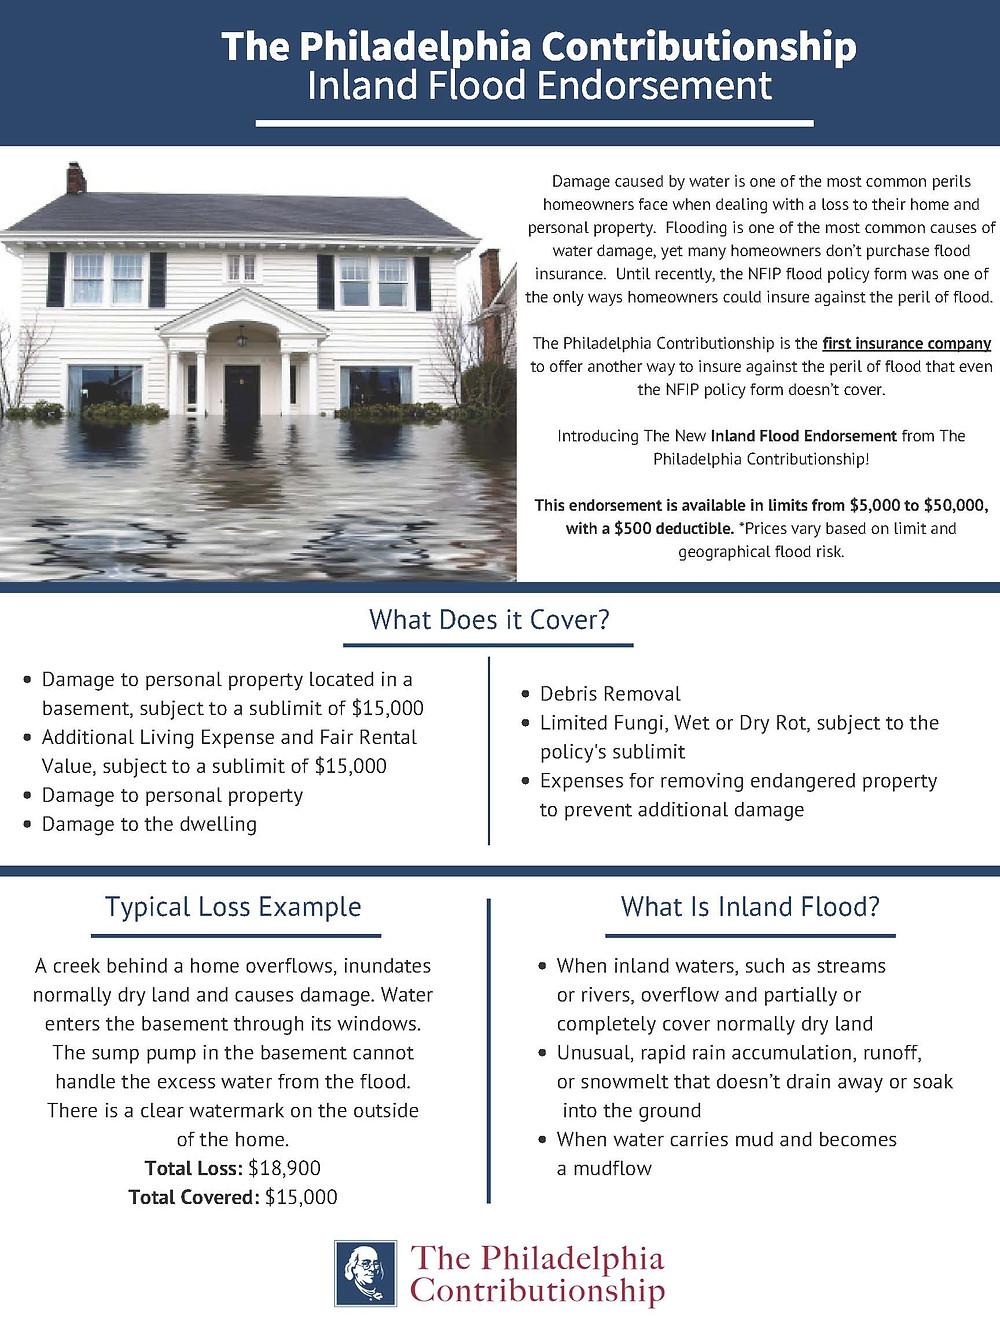 The Philadelphia Contributionship Inland Flood Endorsement